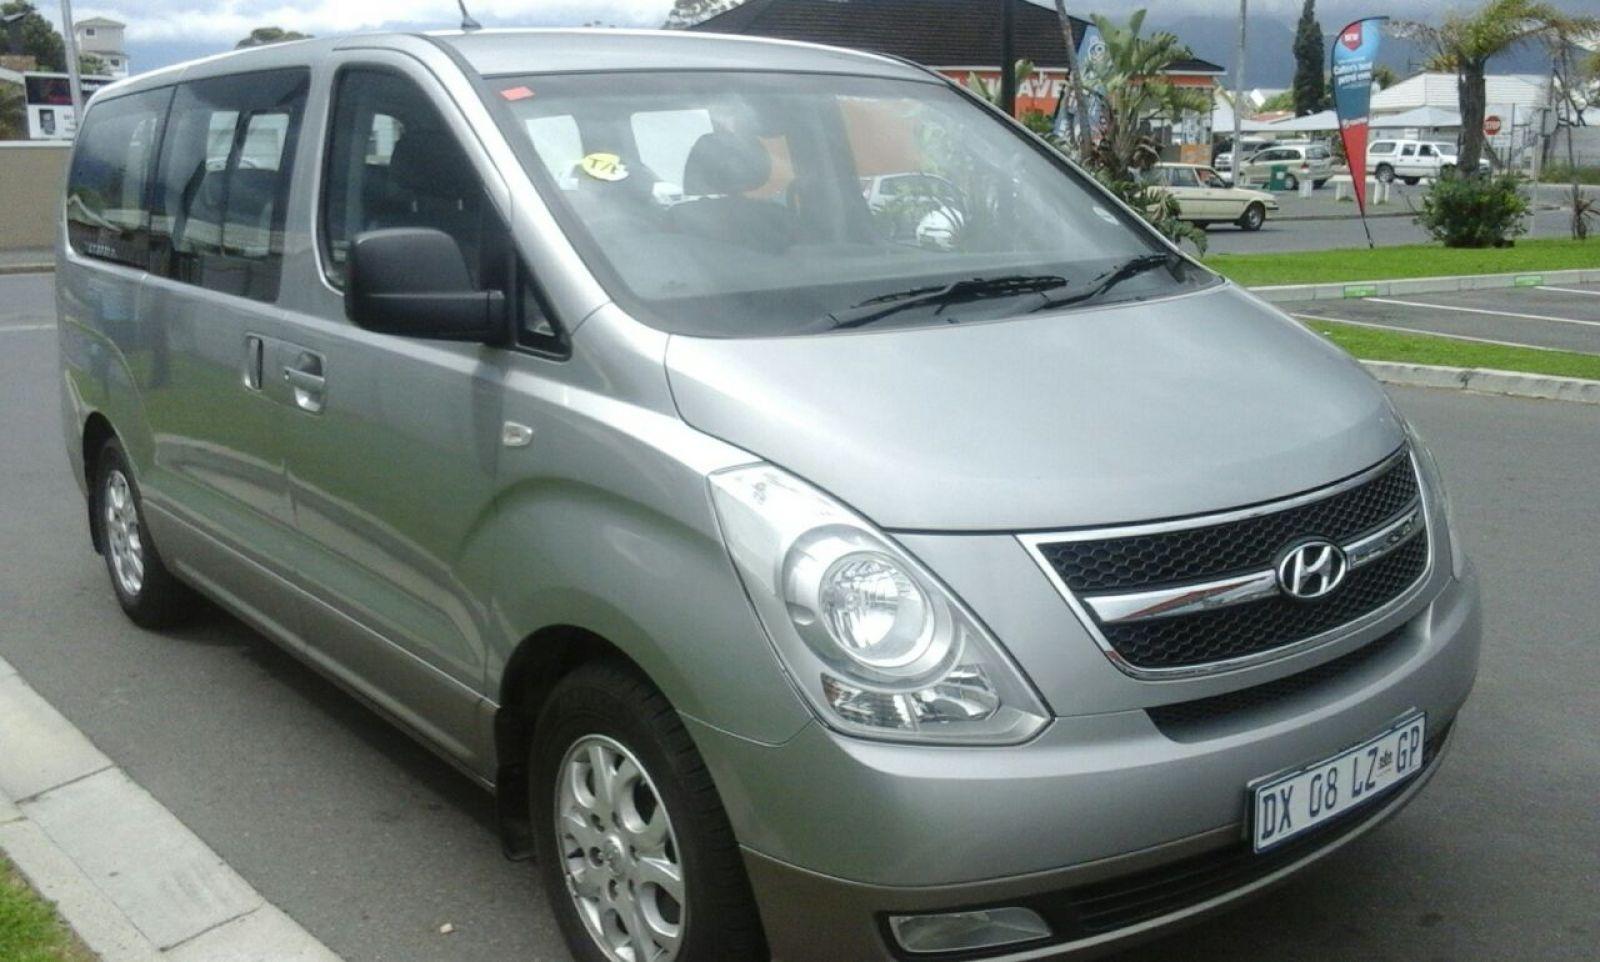 Autonet helderberg h1 h 1 2 5 crdi vgt wagon a t for Hyundai motor finance fax number